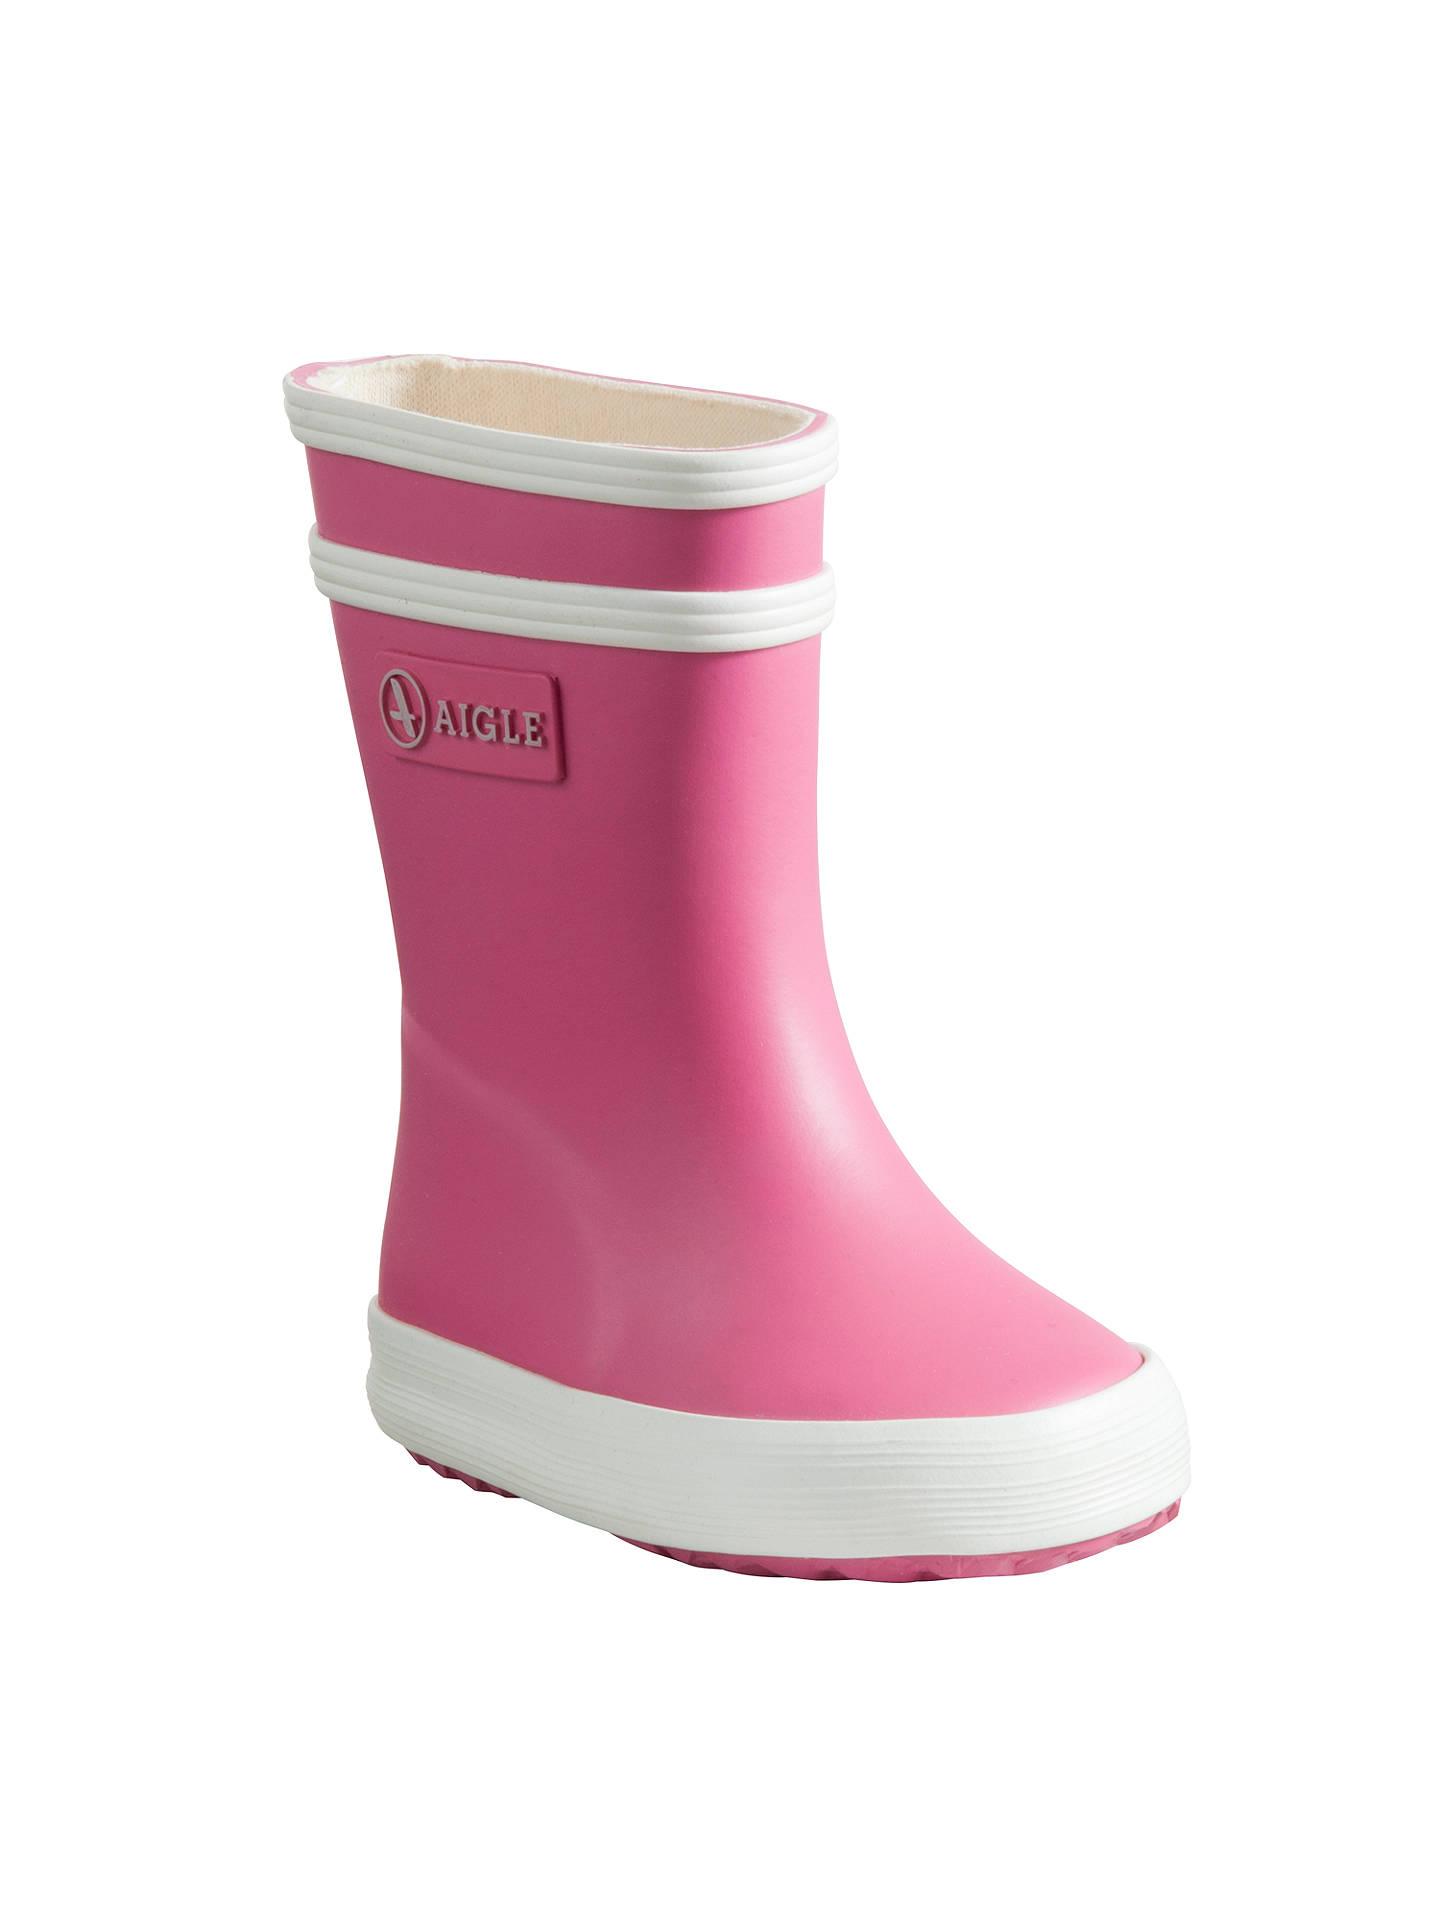 c0b05e8af1ab3 BuyAigle Baby Flac Wellington Boots, Rose, 19 Jnr Online at johnlewis.com  ...